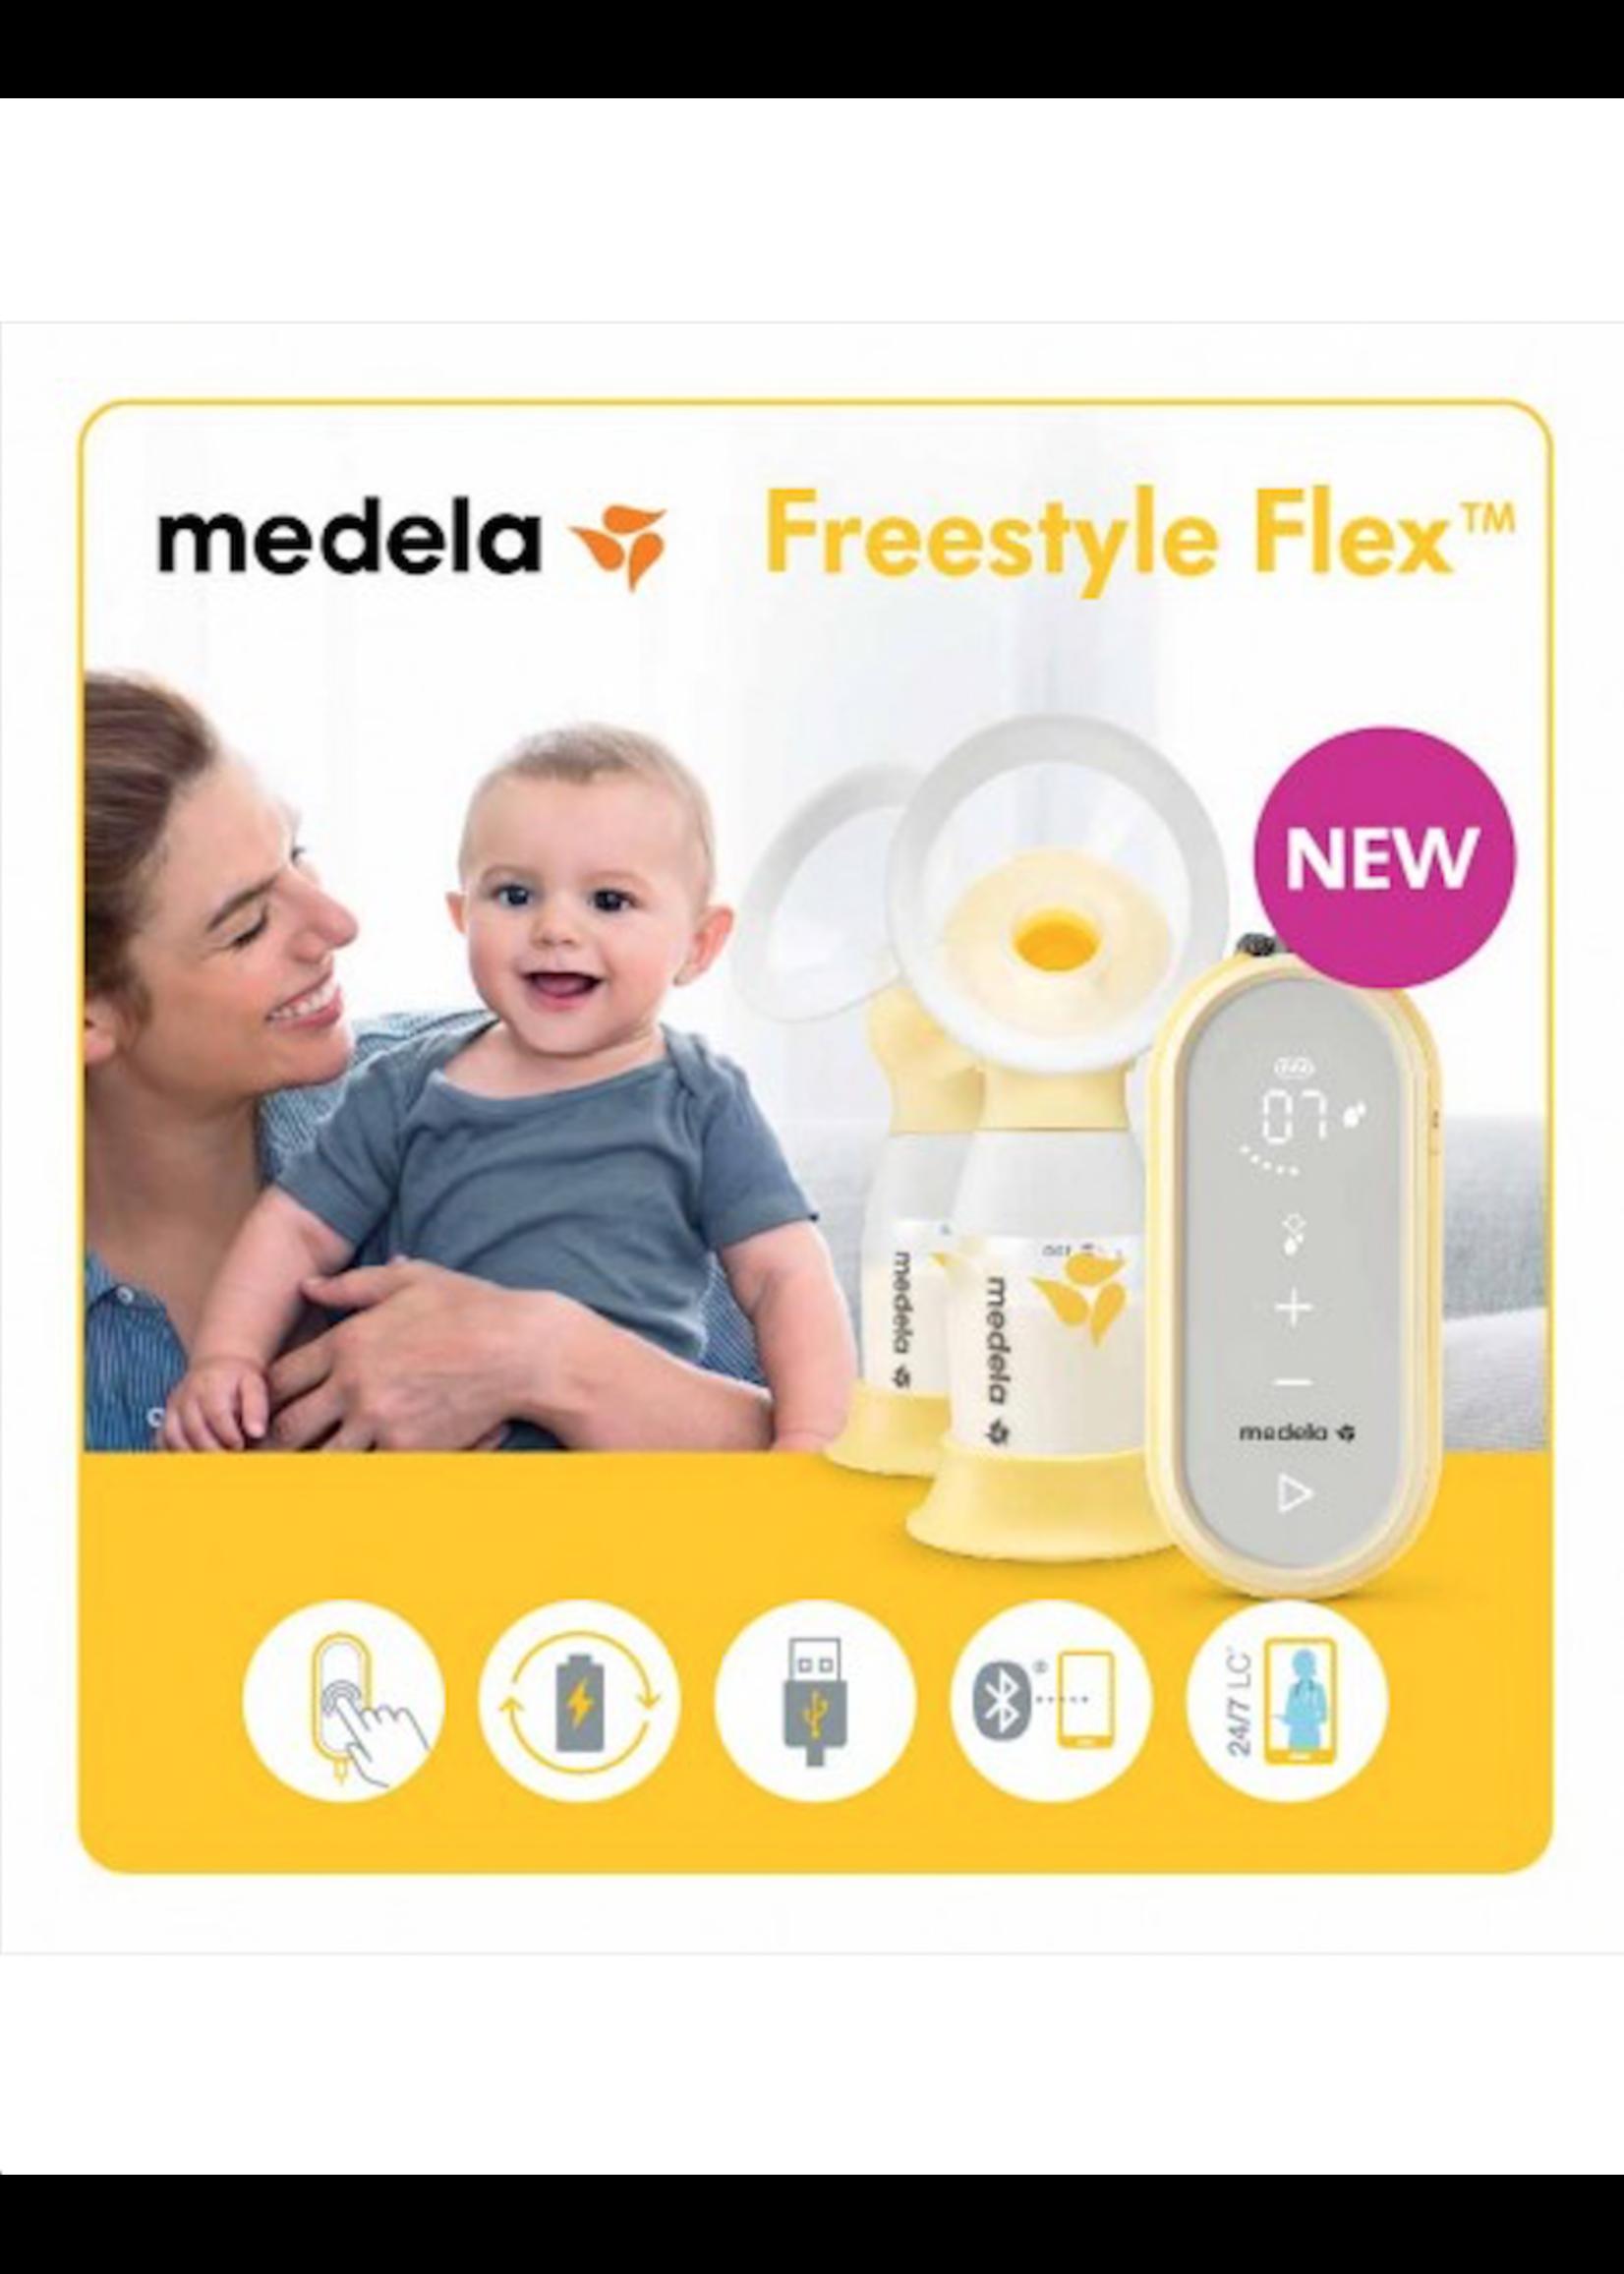 Medela Medela, Freestyle Flex™ 2-Phase Double Electric Breast Pump